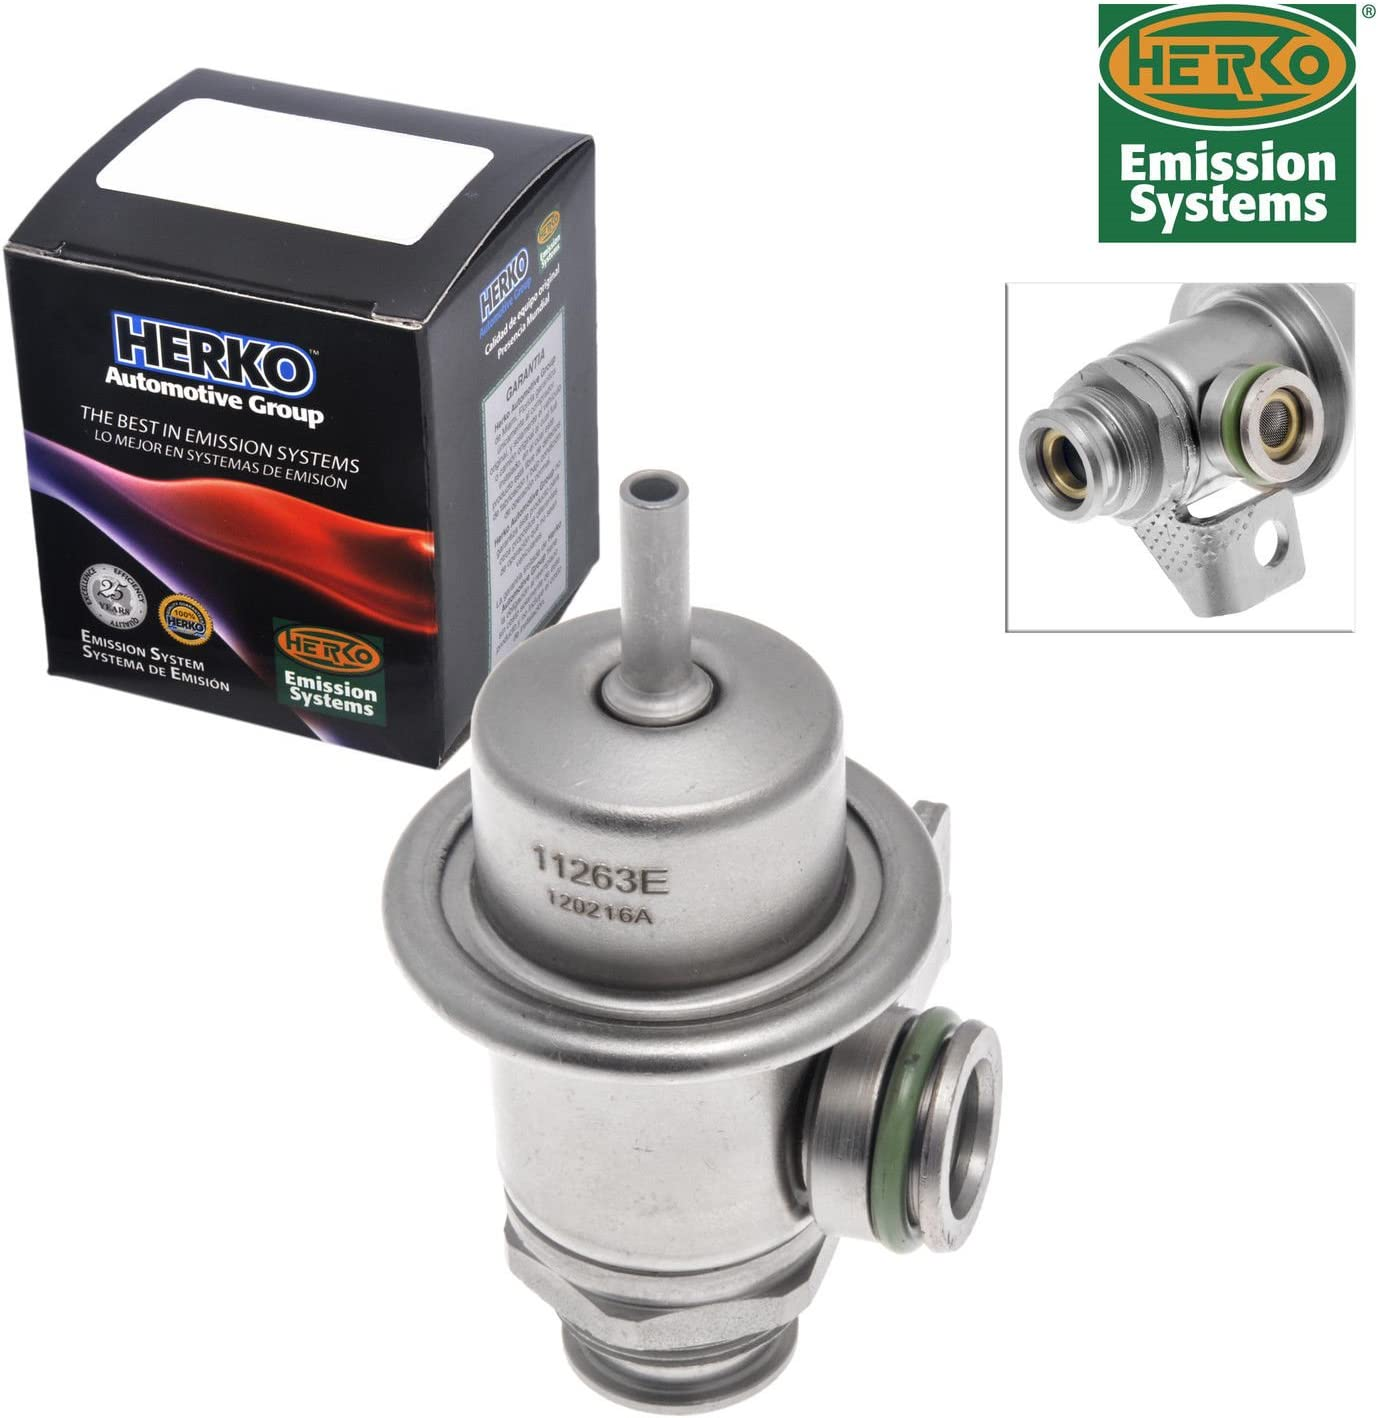 AD Auto Parts New Large-scale sale Ranking TOP10 Herko Fuel Pontiac PR4135 Pressure C Regulator